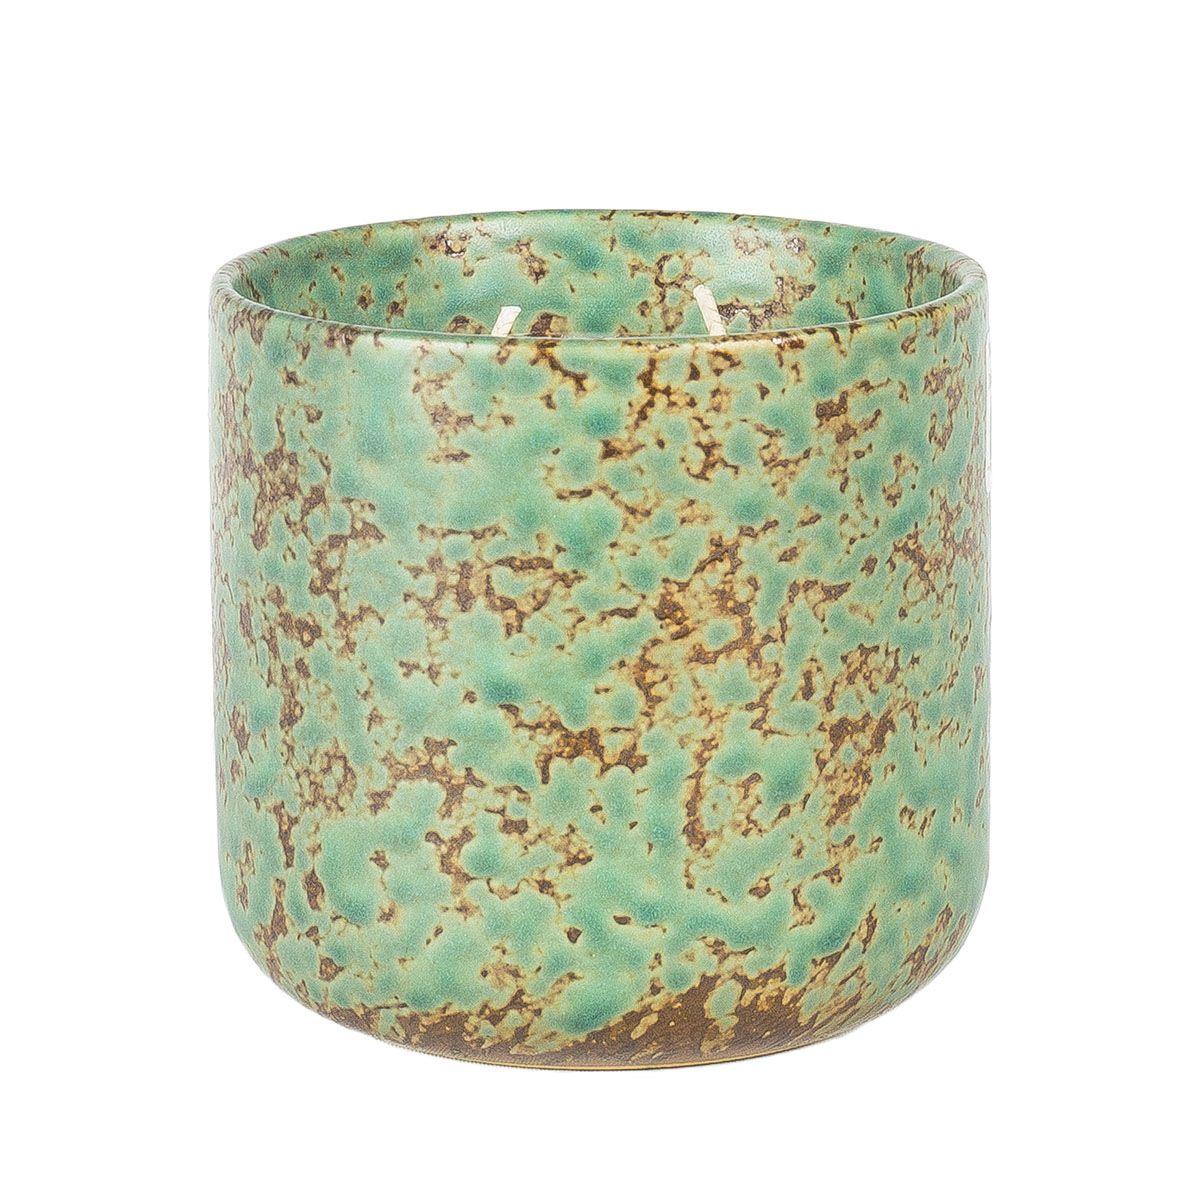 Doftljus wasabi/watercress grön keramik